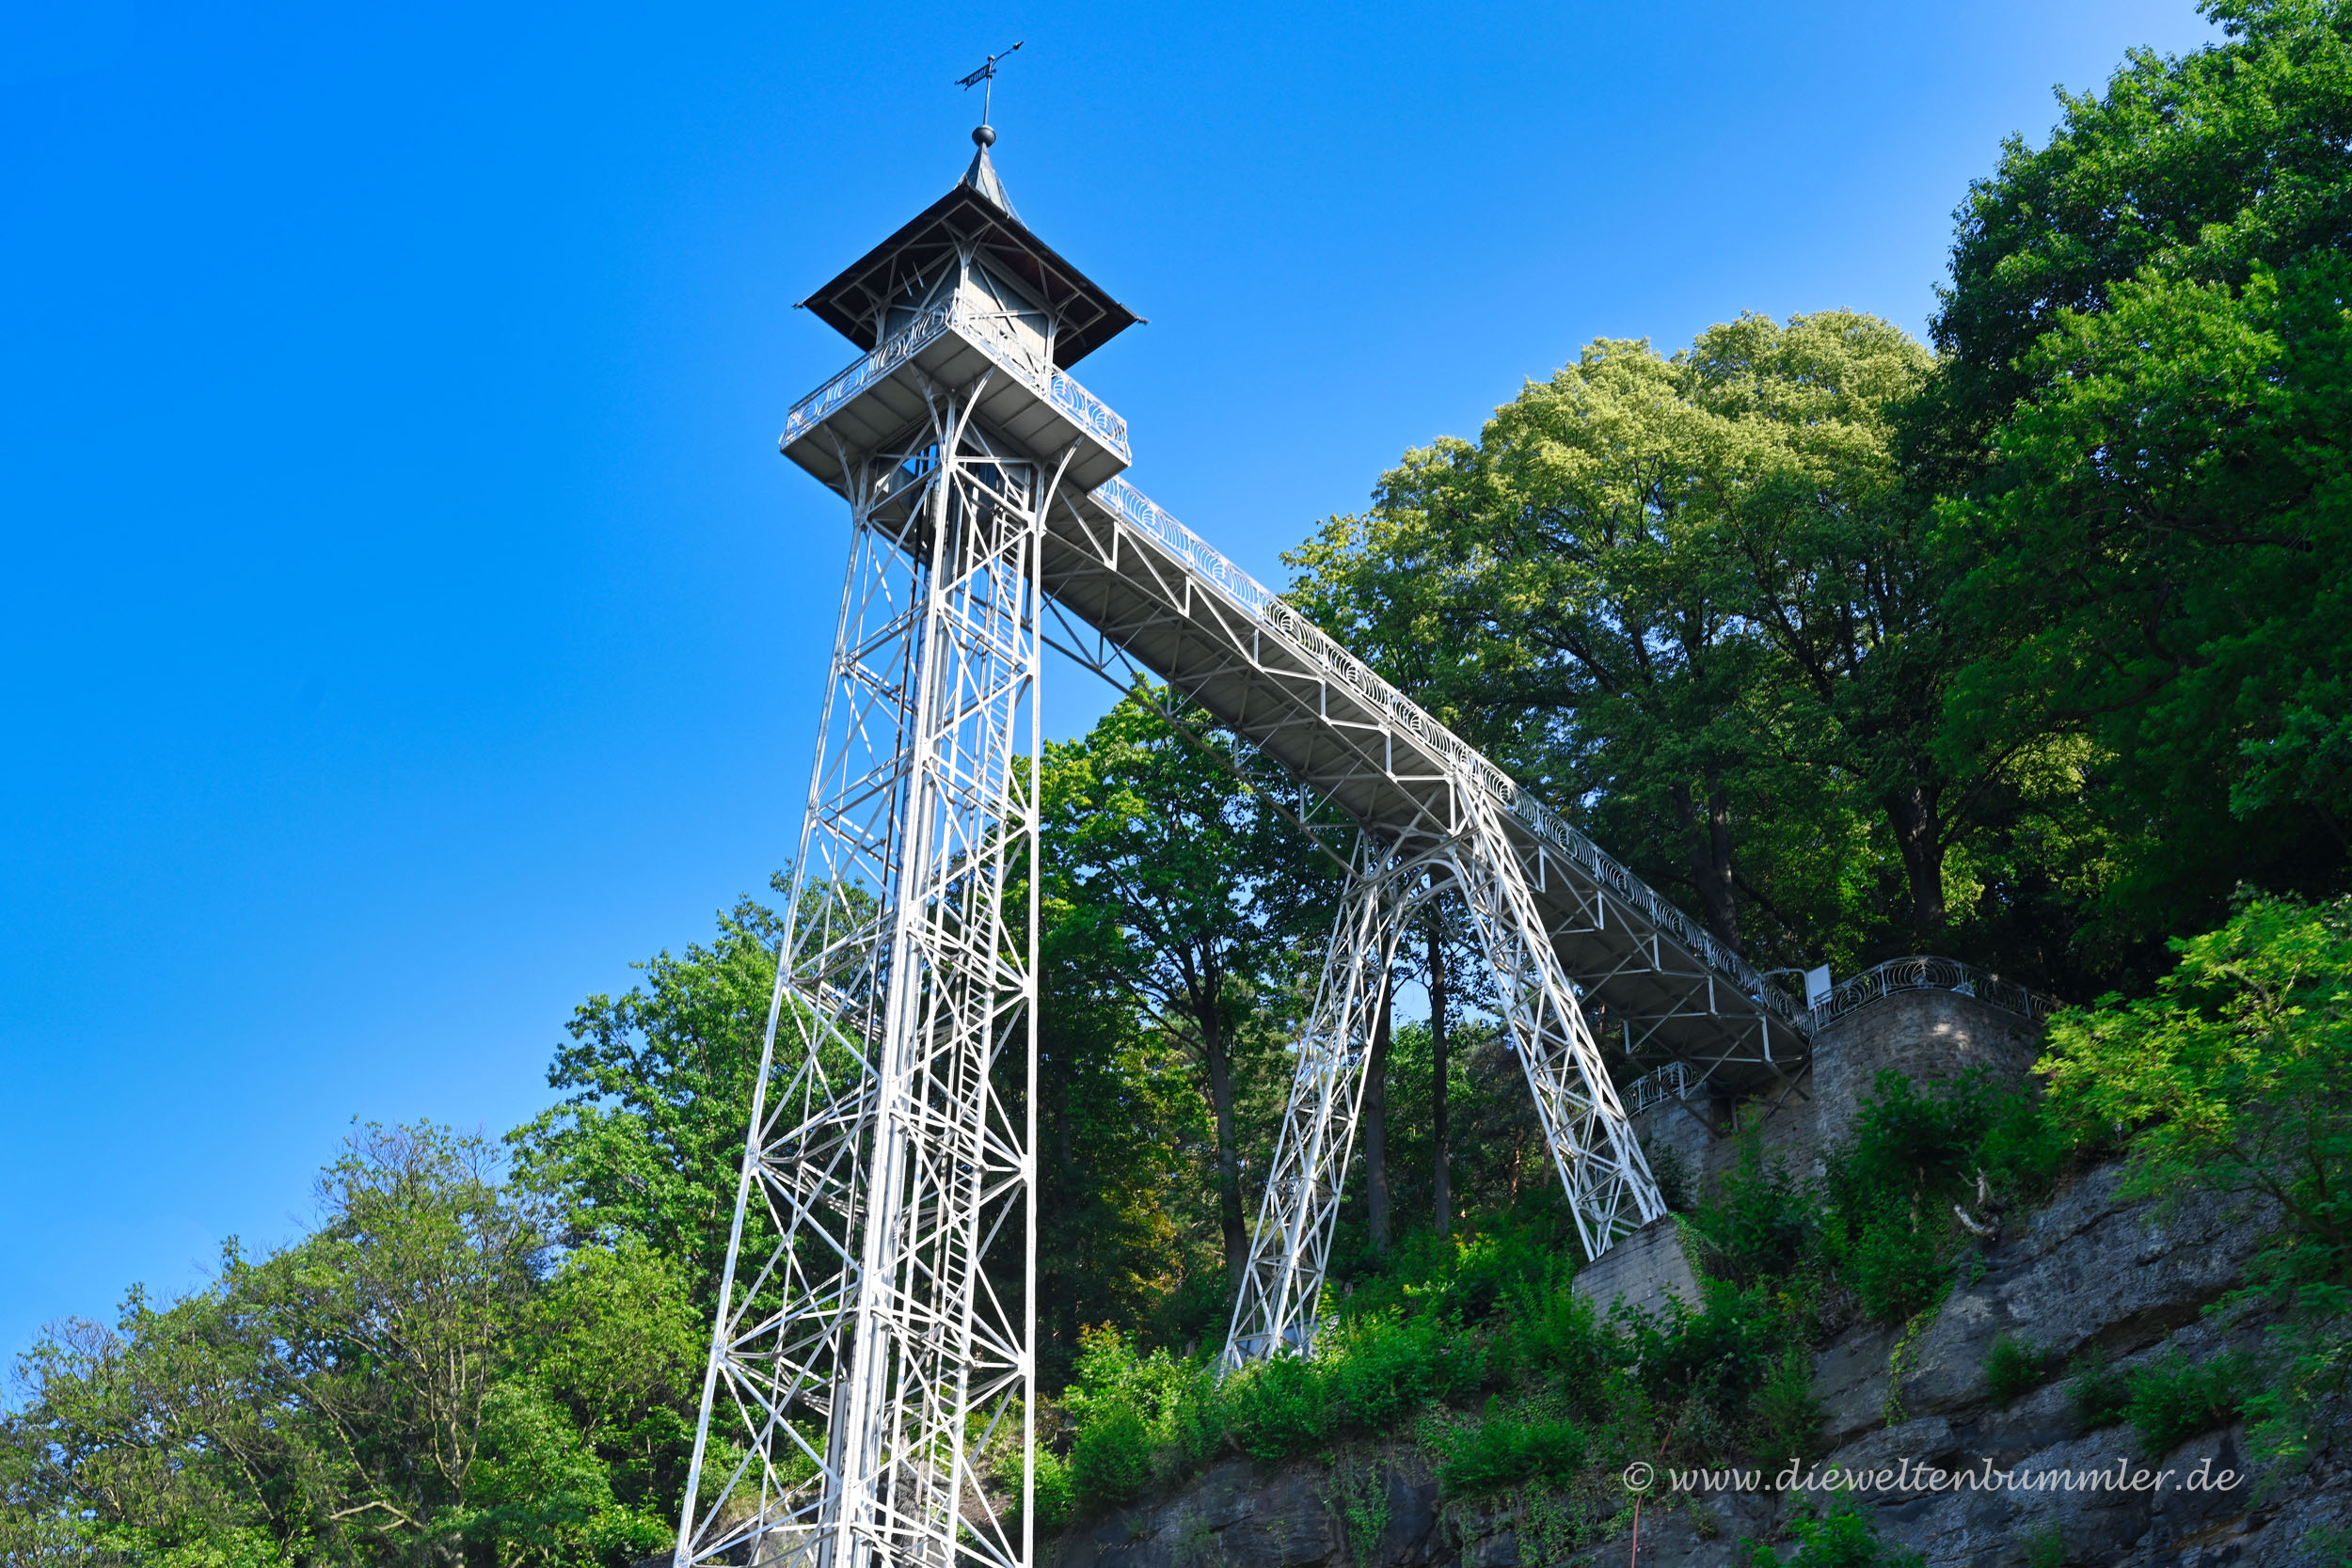 Fahrstuhl in Bad Schandau